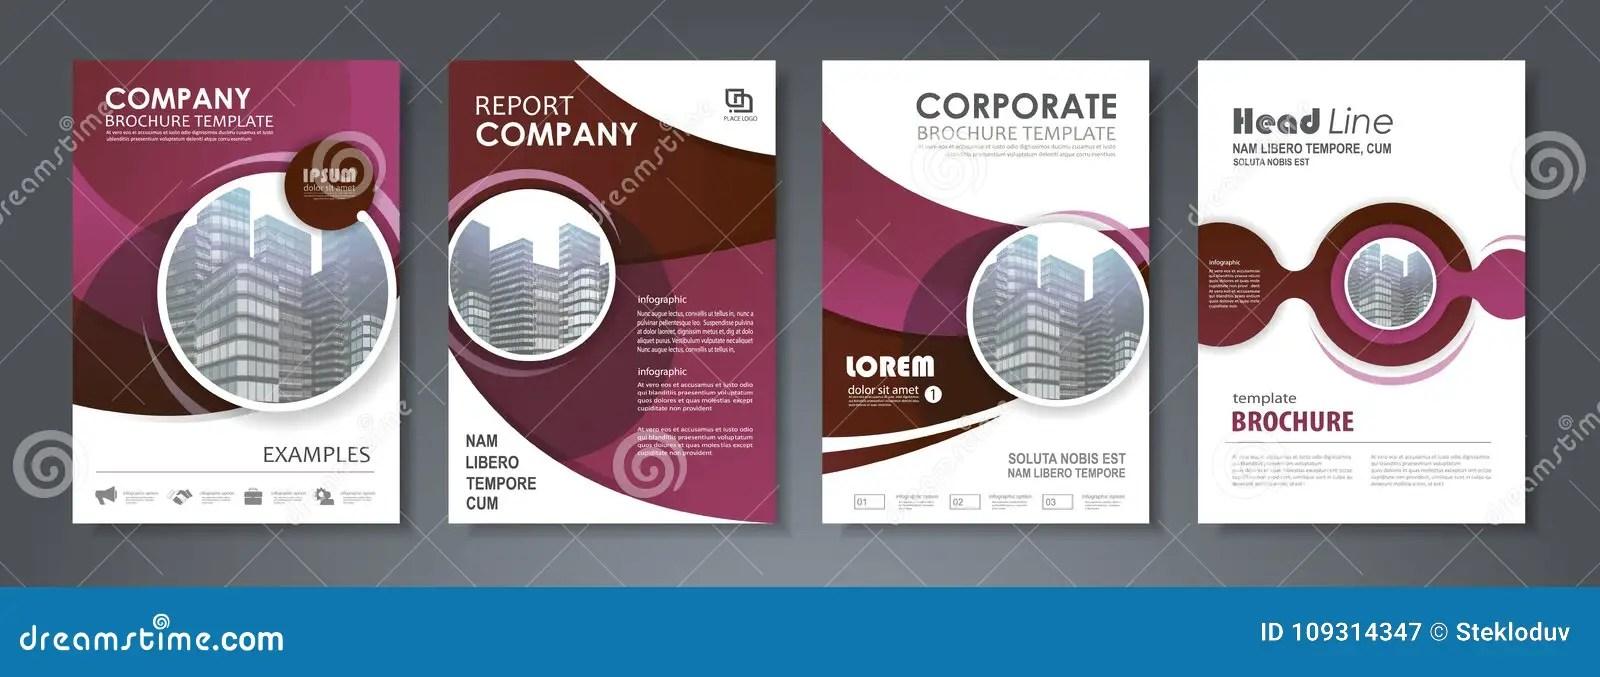 Annual report brochure stock vector Illustration of flyer - 109314347